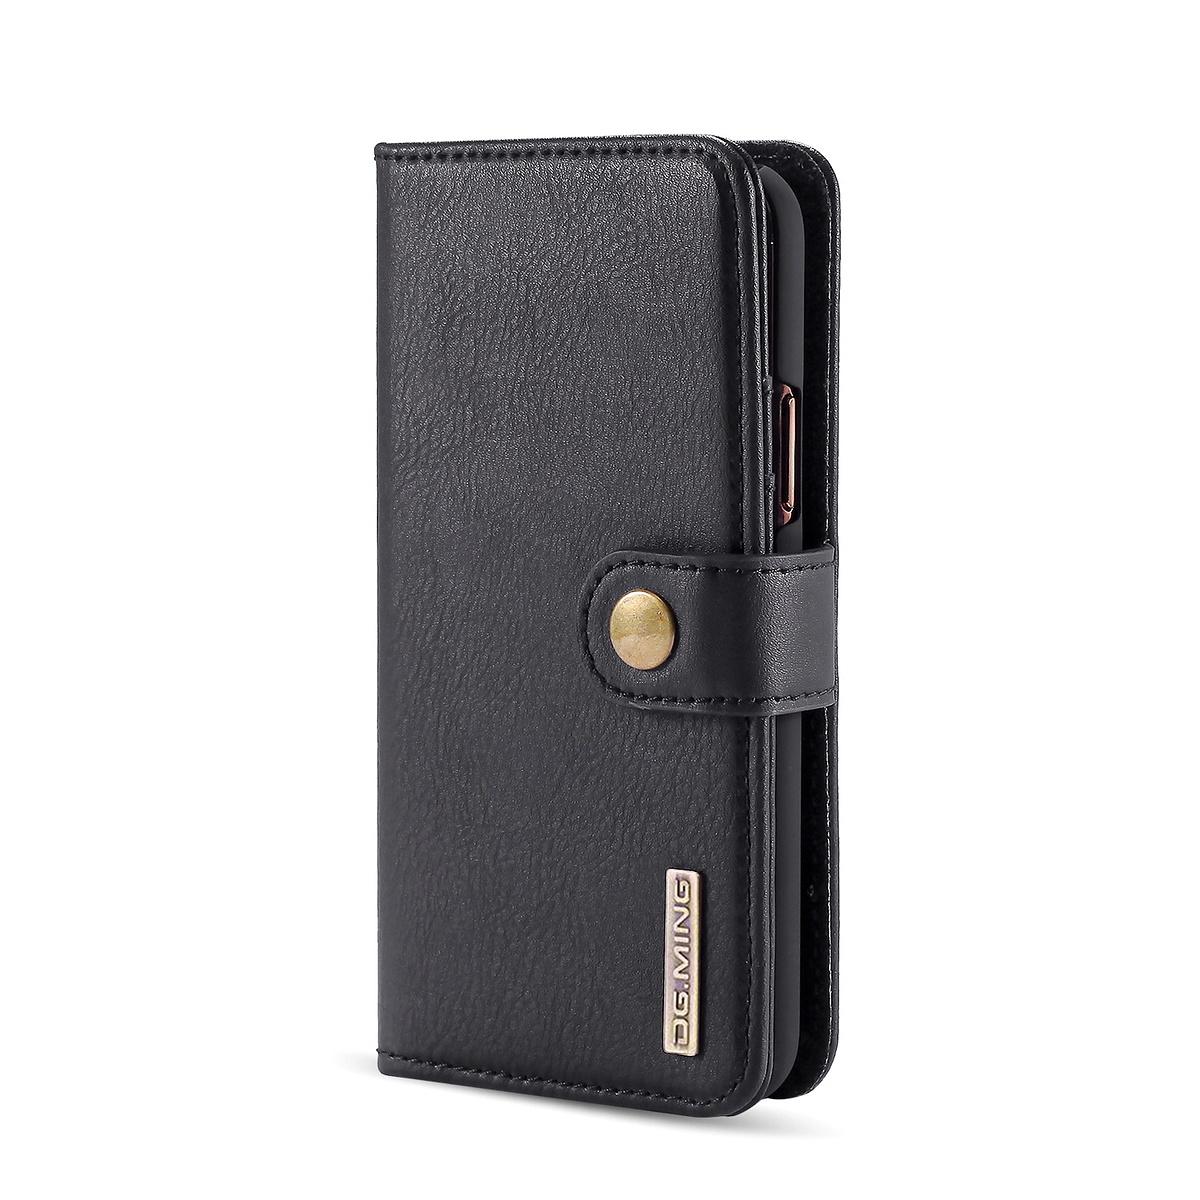 DG.MING fodral med magnetskal & ställ, iPhone 11 Pro, svart